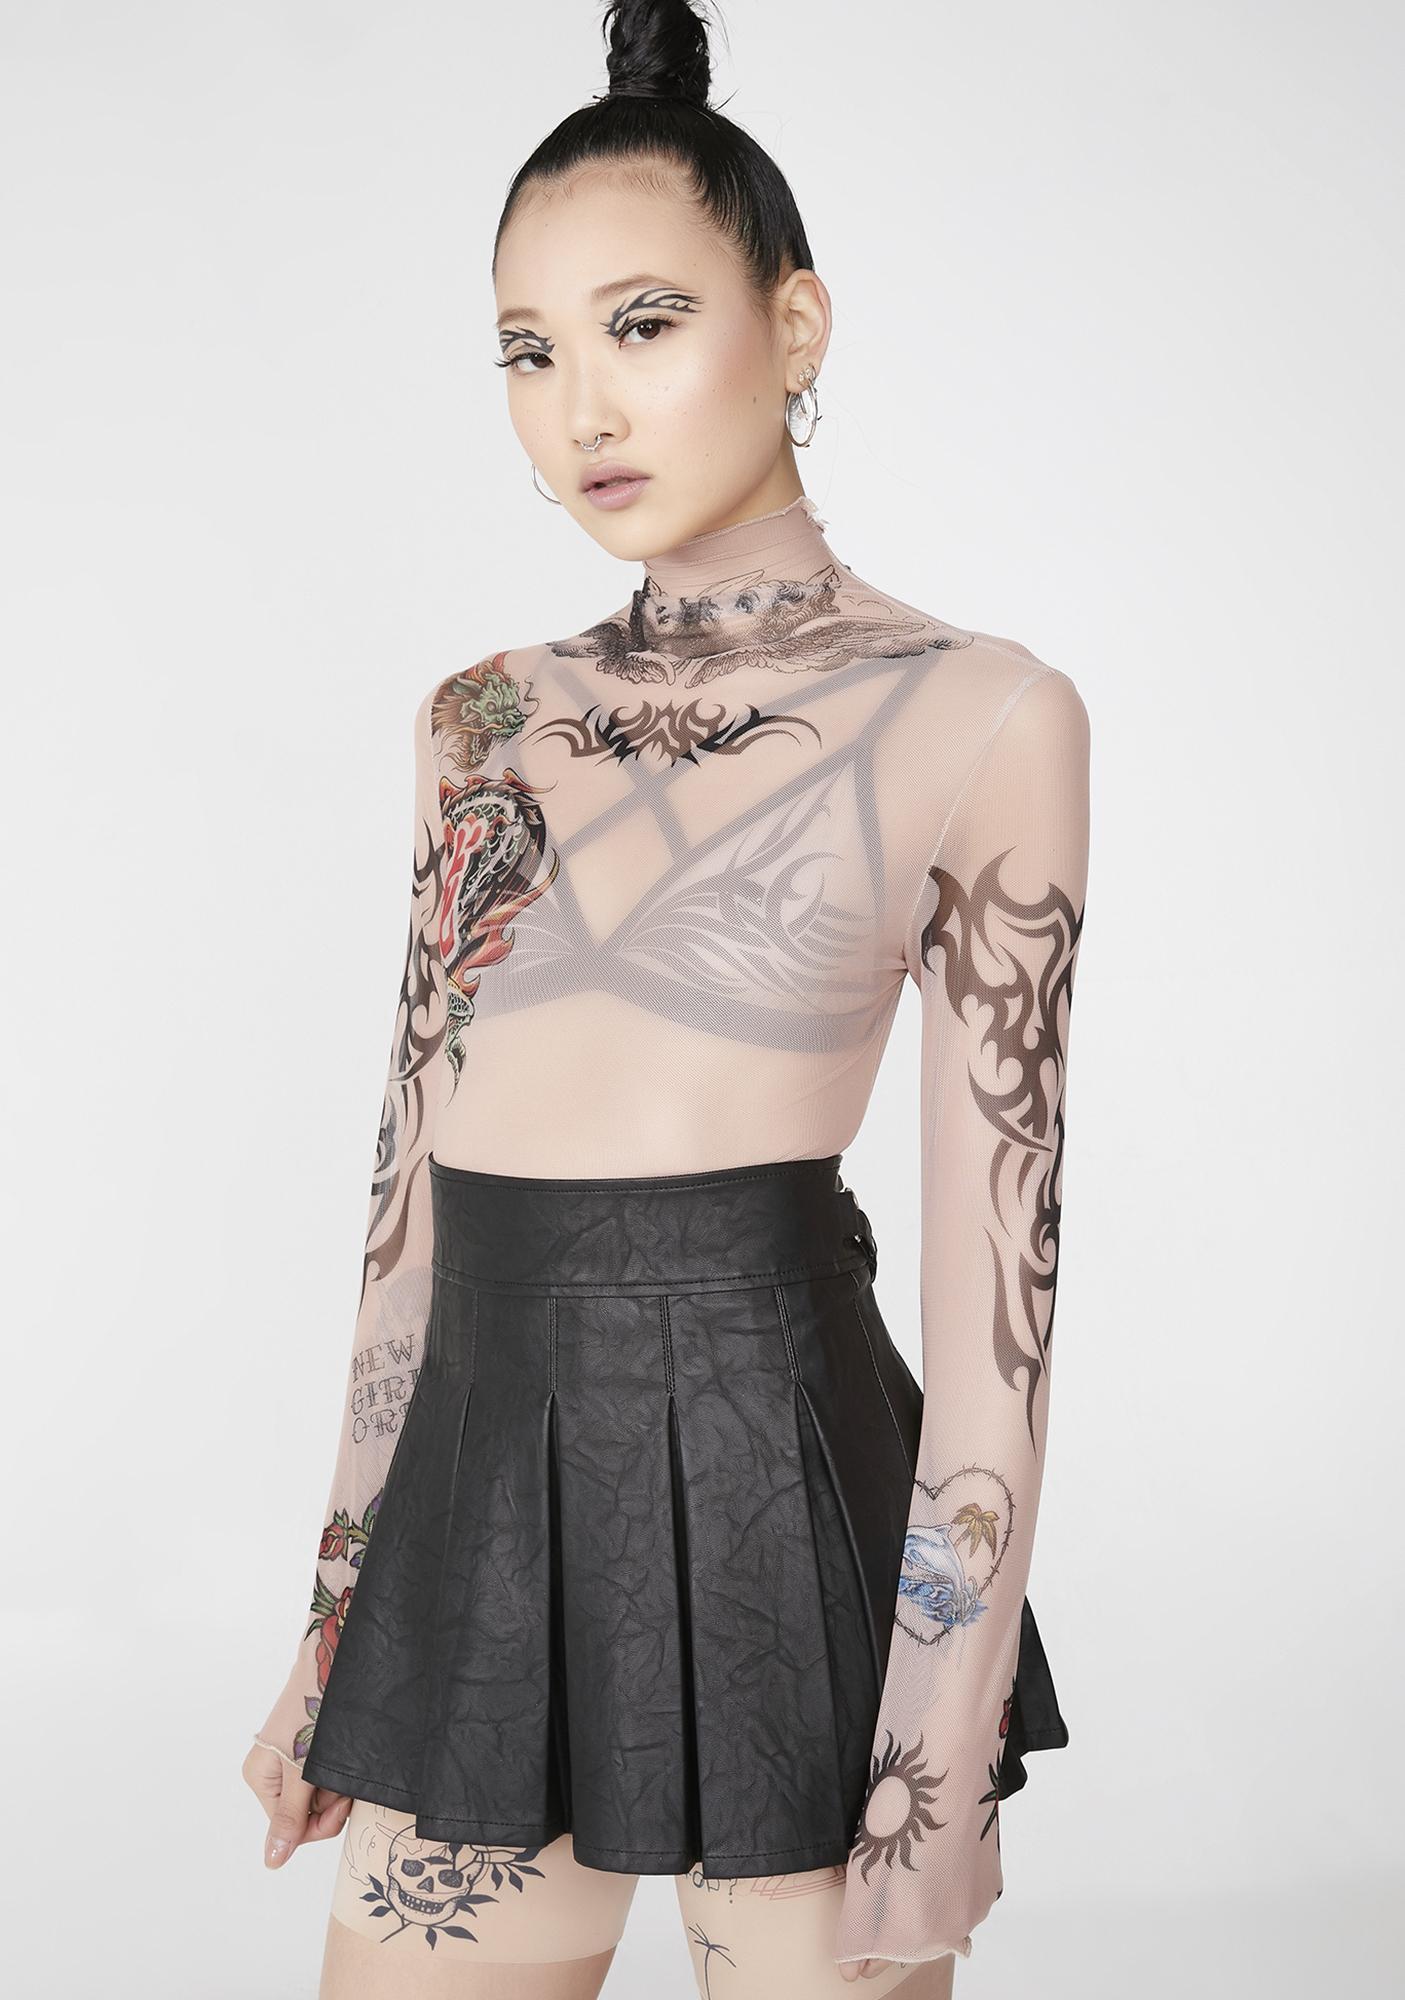 NEW GIRL ORDER Tattoo Mesh Long Sleeve Top